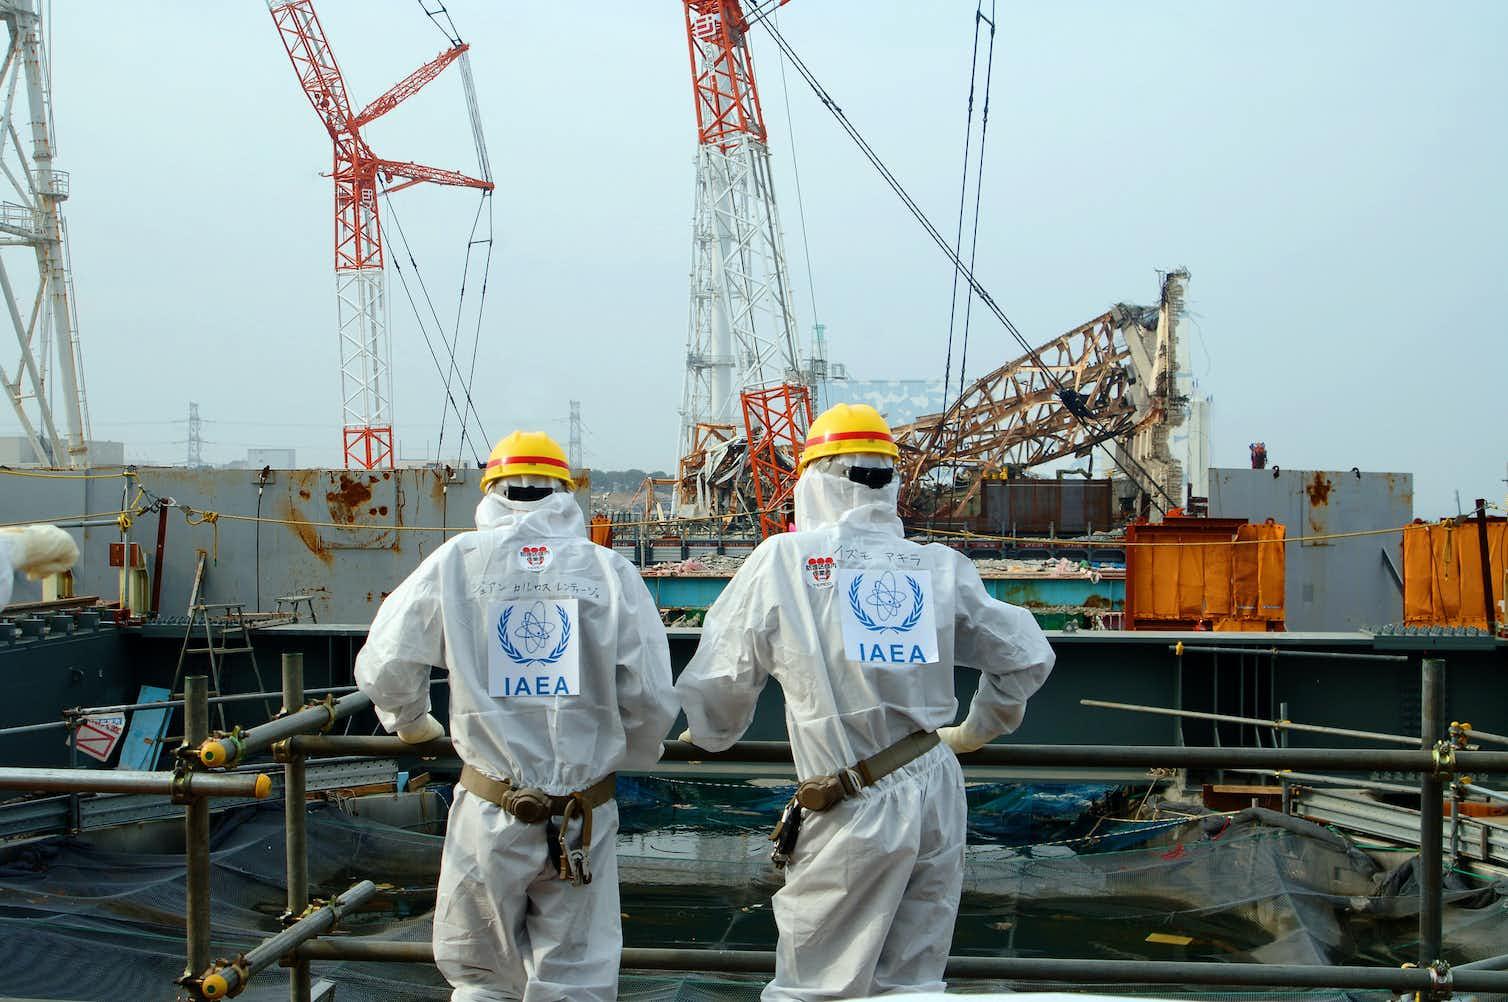 Two IAEA agents examine work Unit 4 of the Fukushima Daiichi Nuclear Power Station (April 17, 2013). Photo credit: Greg Webb/IAEA, CC BY